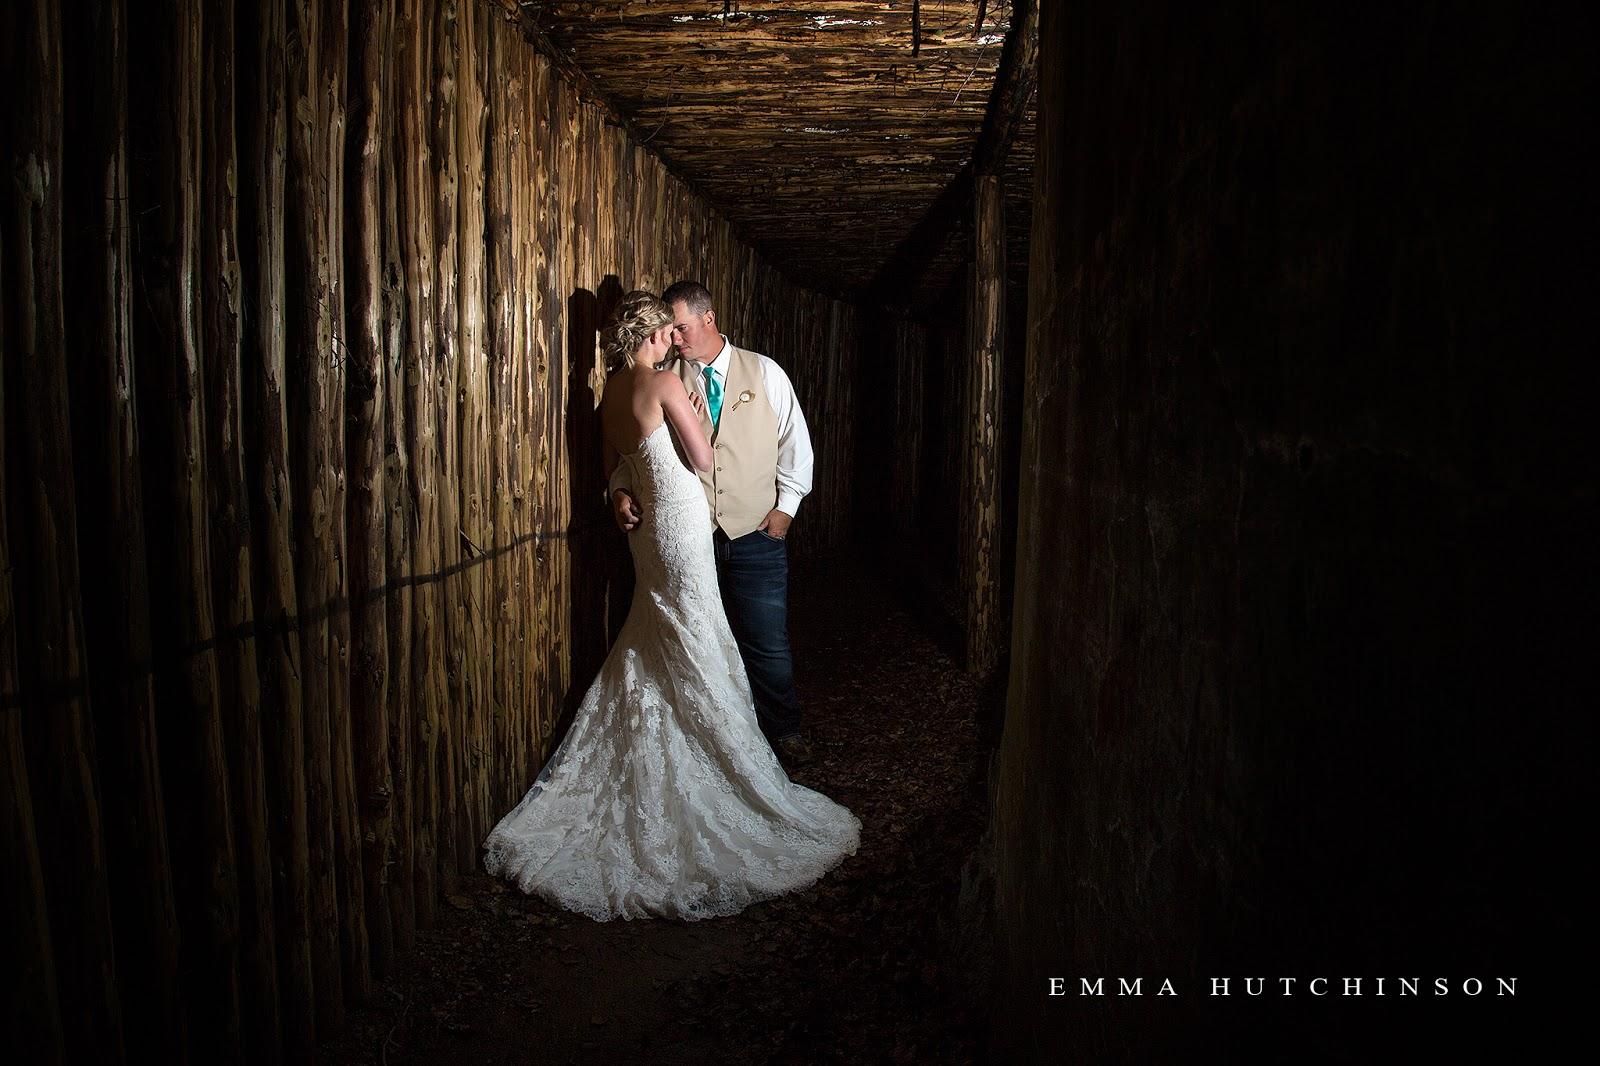 Newfoundland backyard wedding - Bride and groom in dark tunnel - cool light